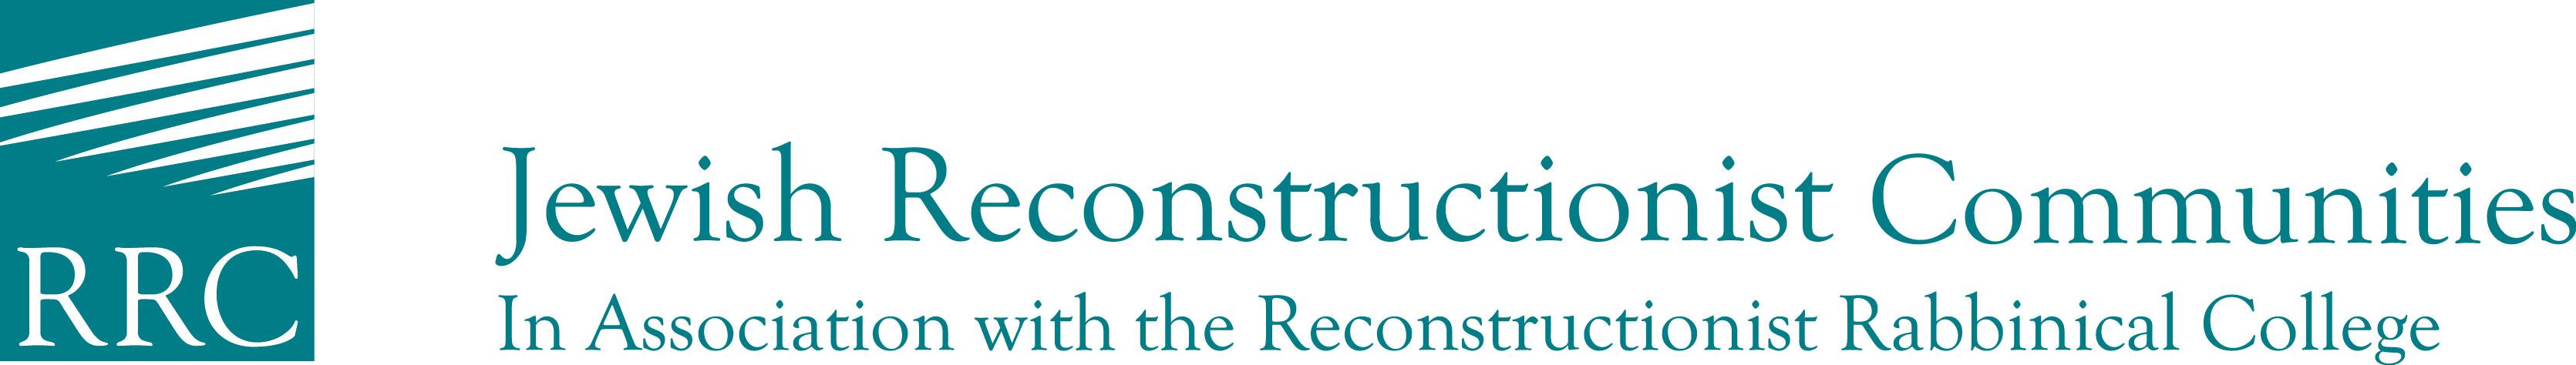 Jewish Reconstructionist Communities